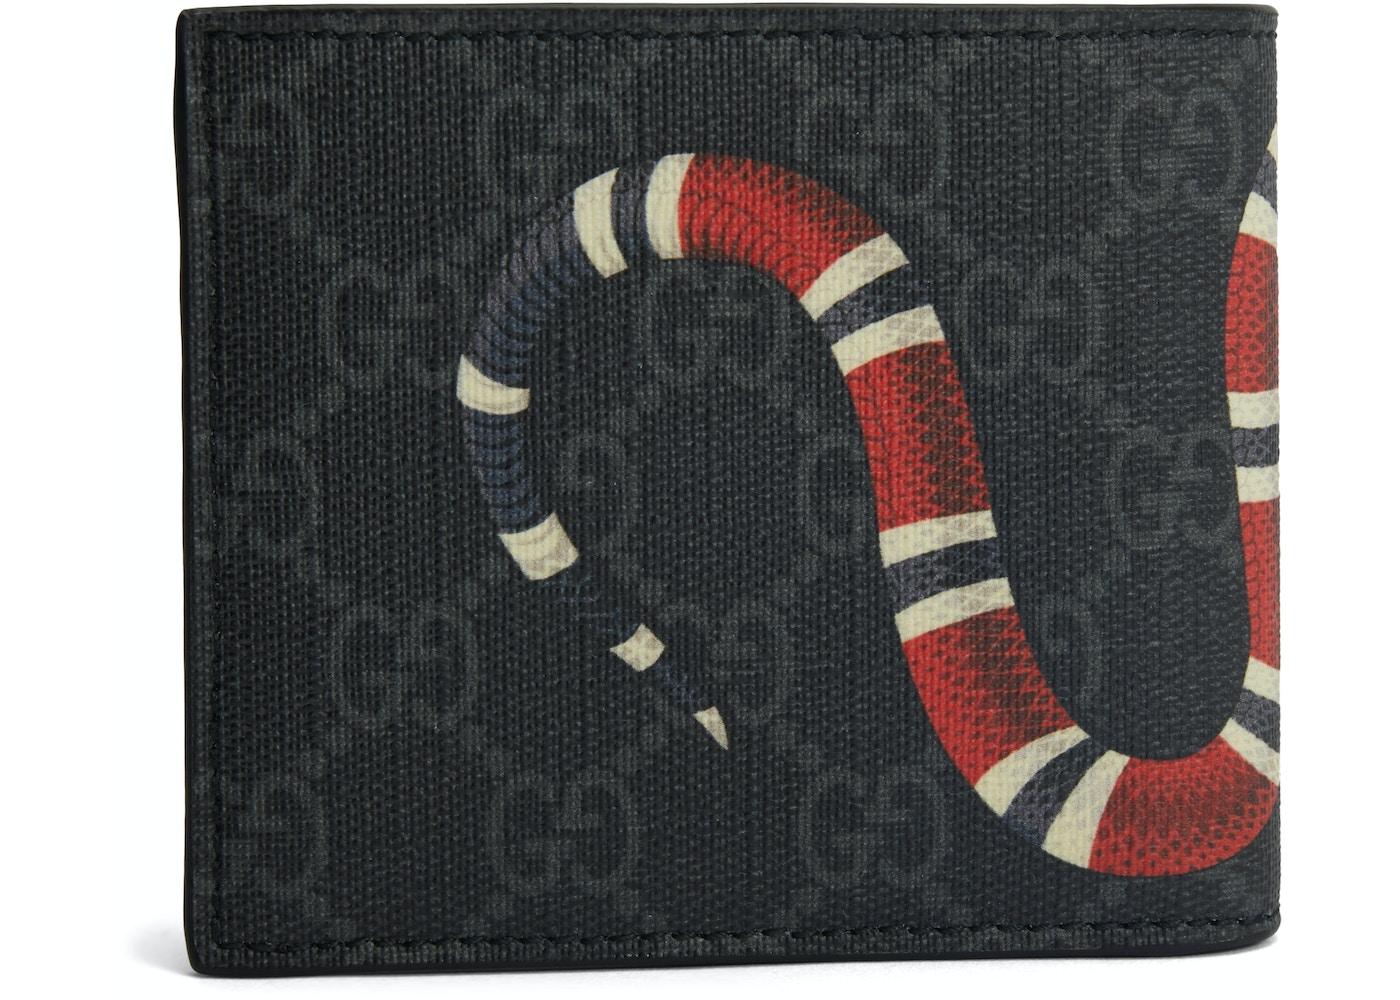 da80161c659147 Buy & Sell Gucci Handbags - New Lowest Asks